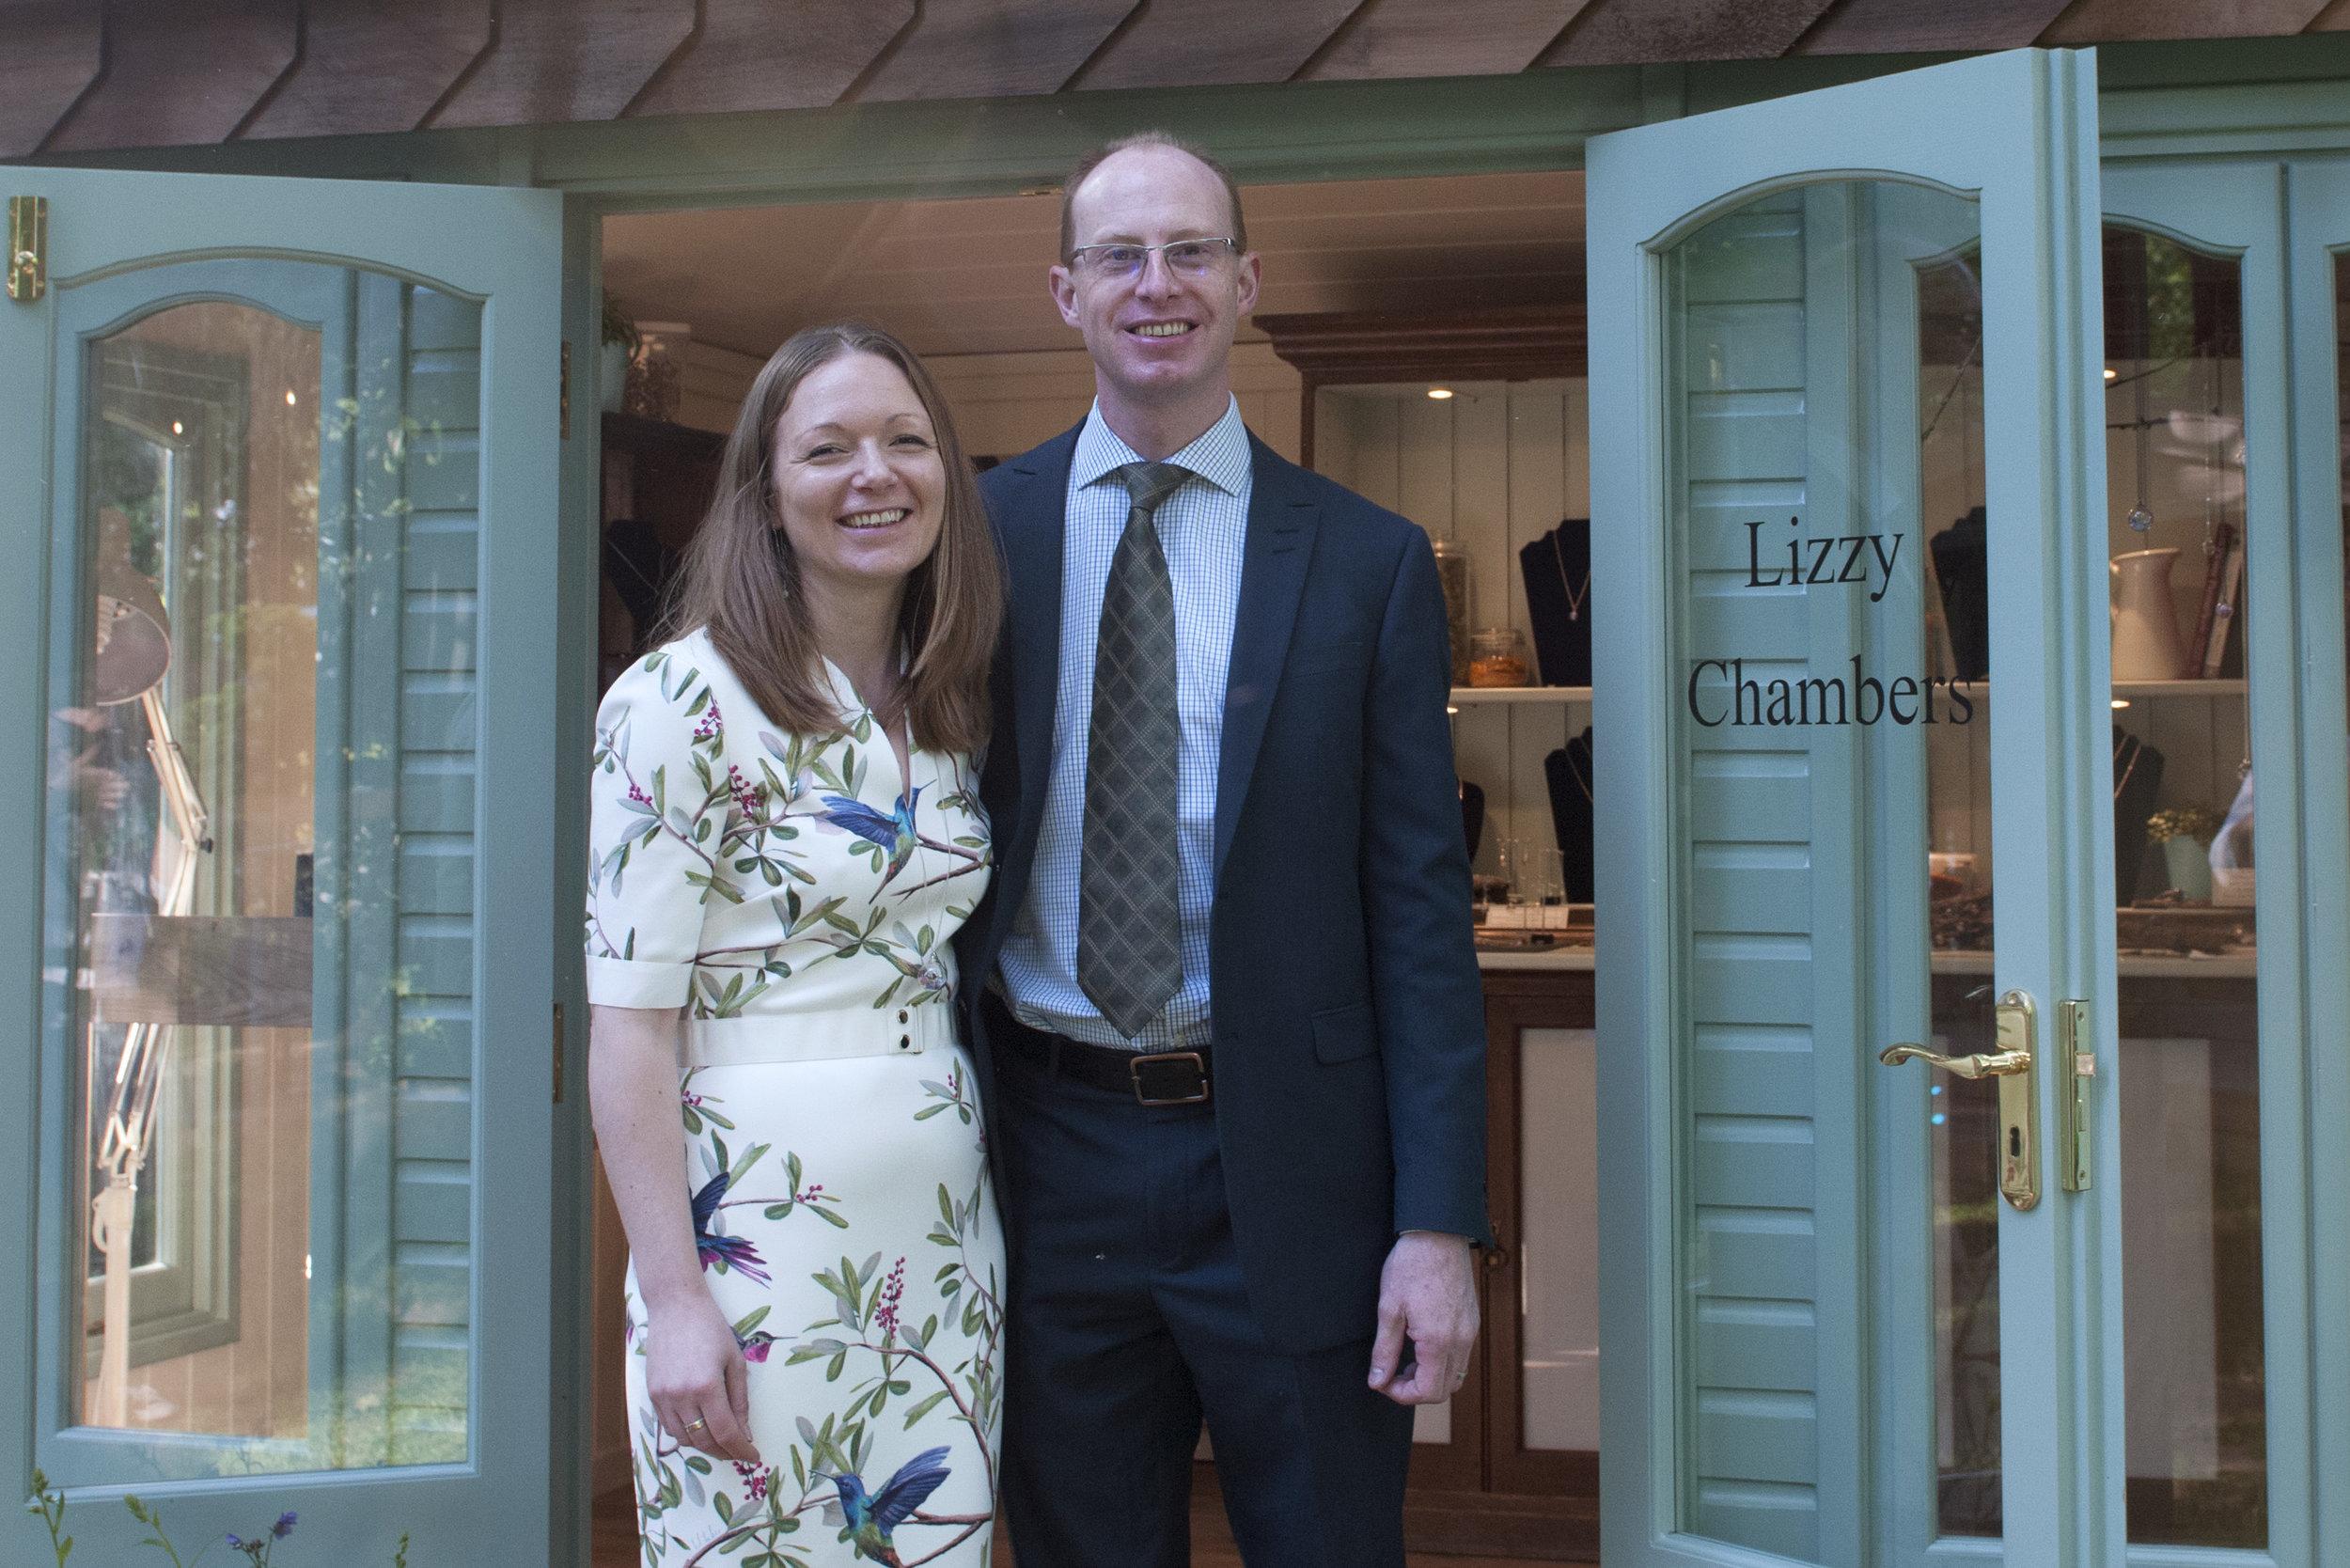 Lizzy Chambers and husband.jpg